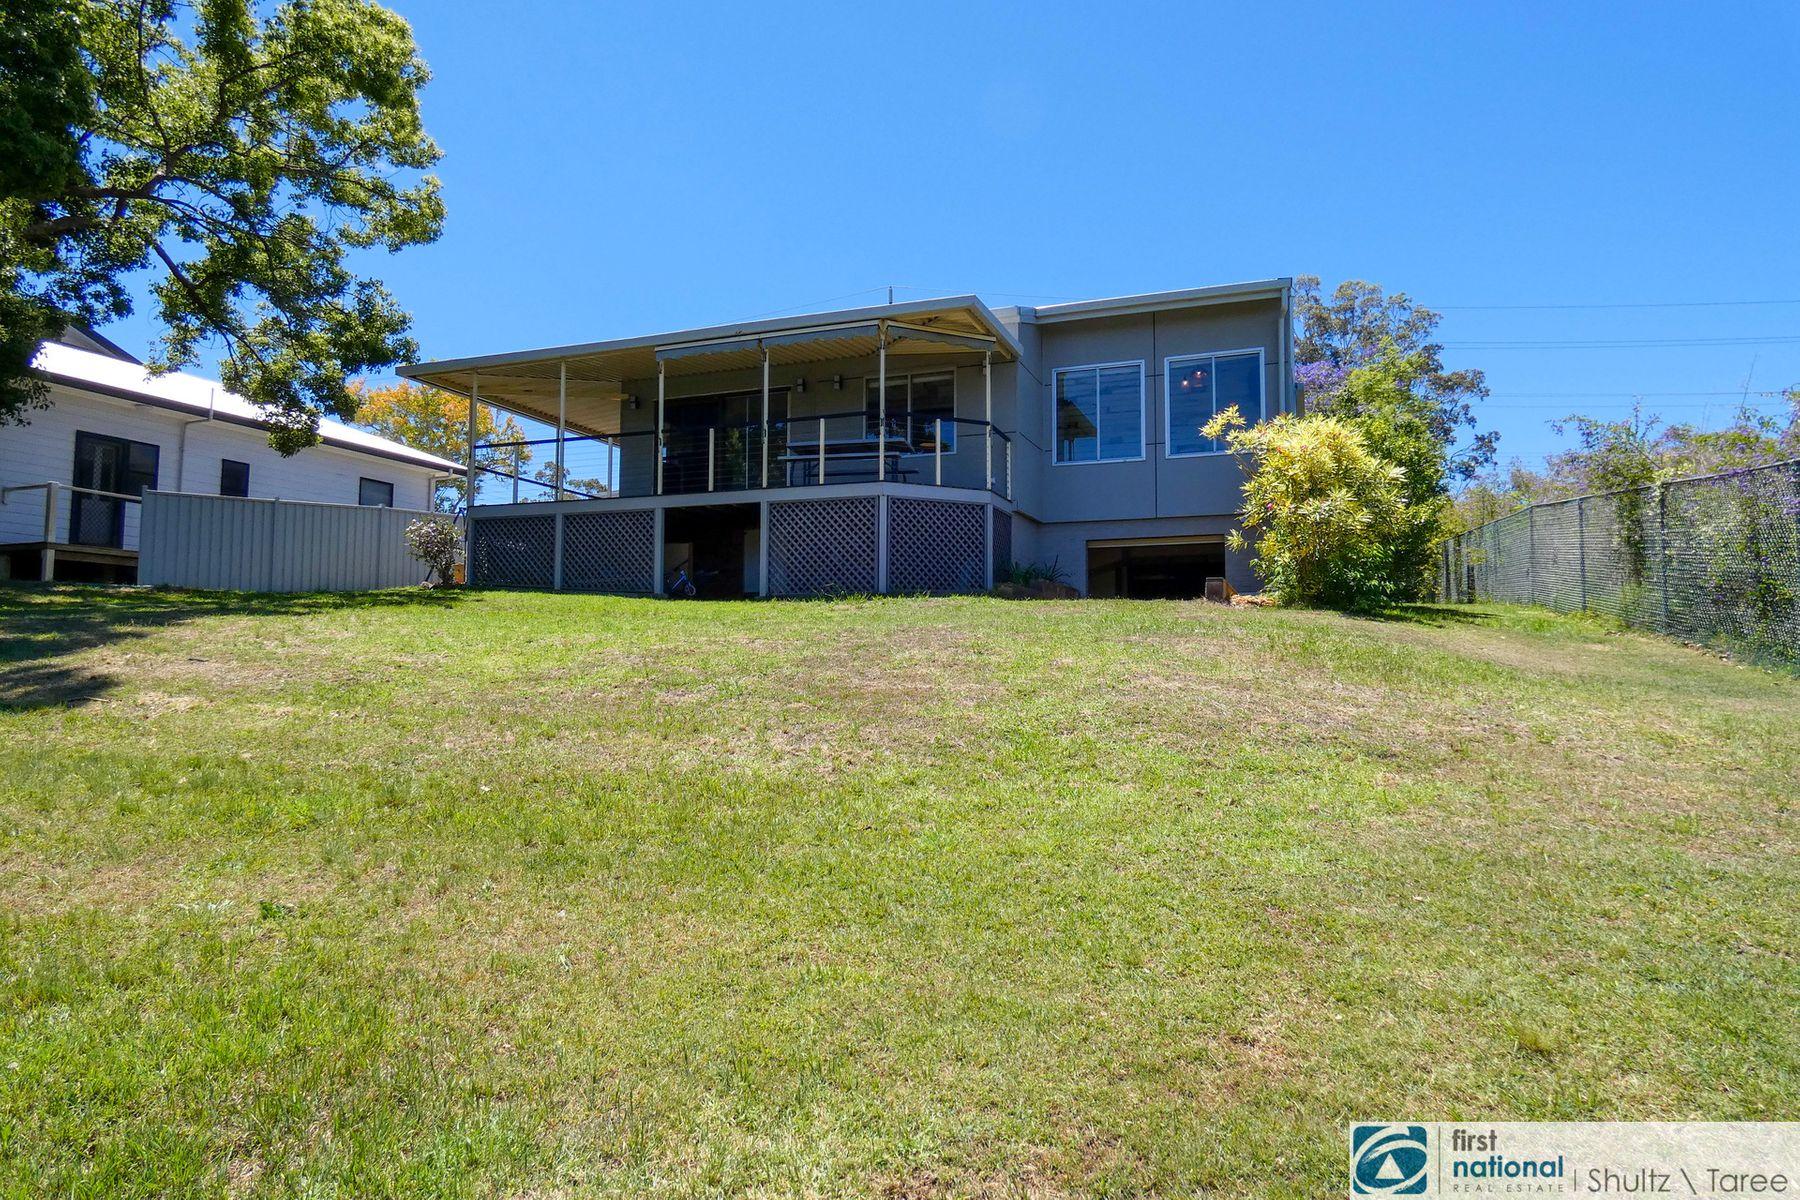 124 Wingham Road, Taree, NSW 2430